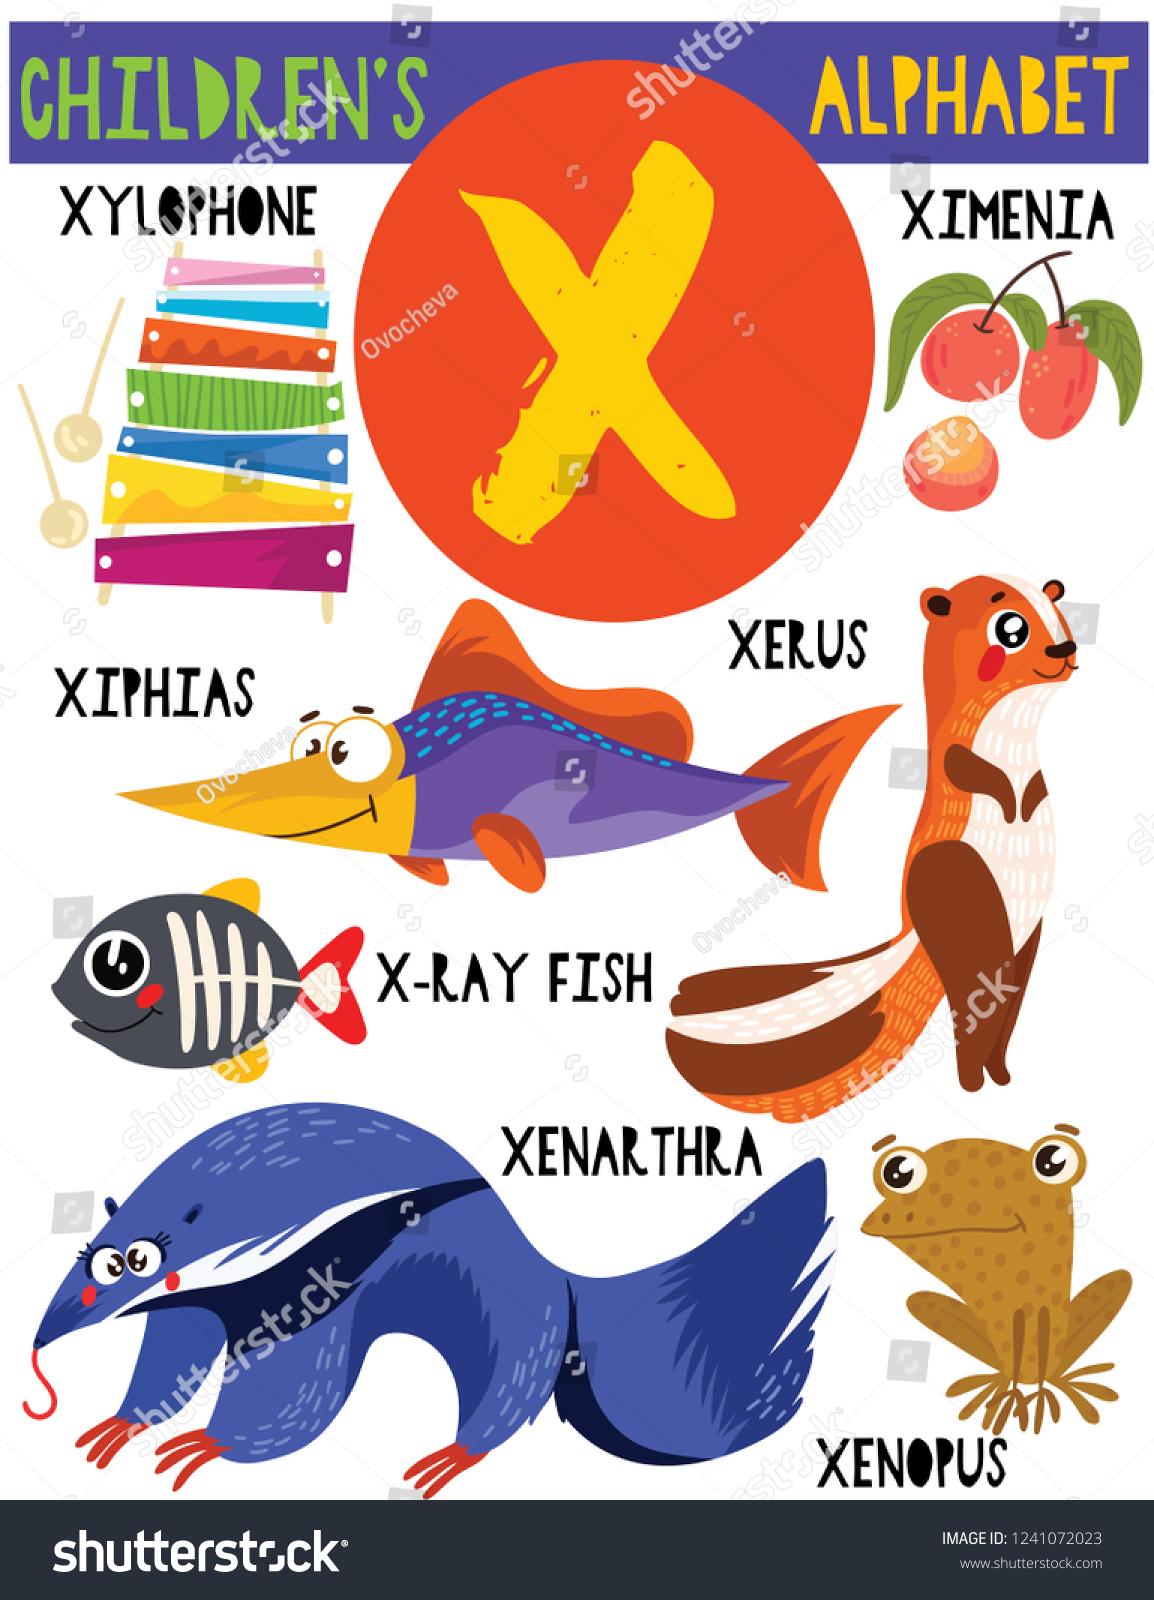 Letter X Cute Childrens Alphabet Adorable Animals Stock Vector